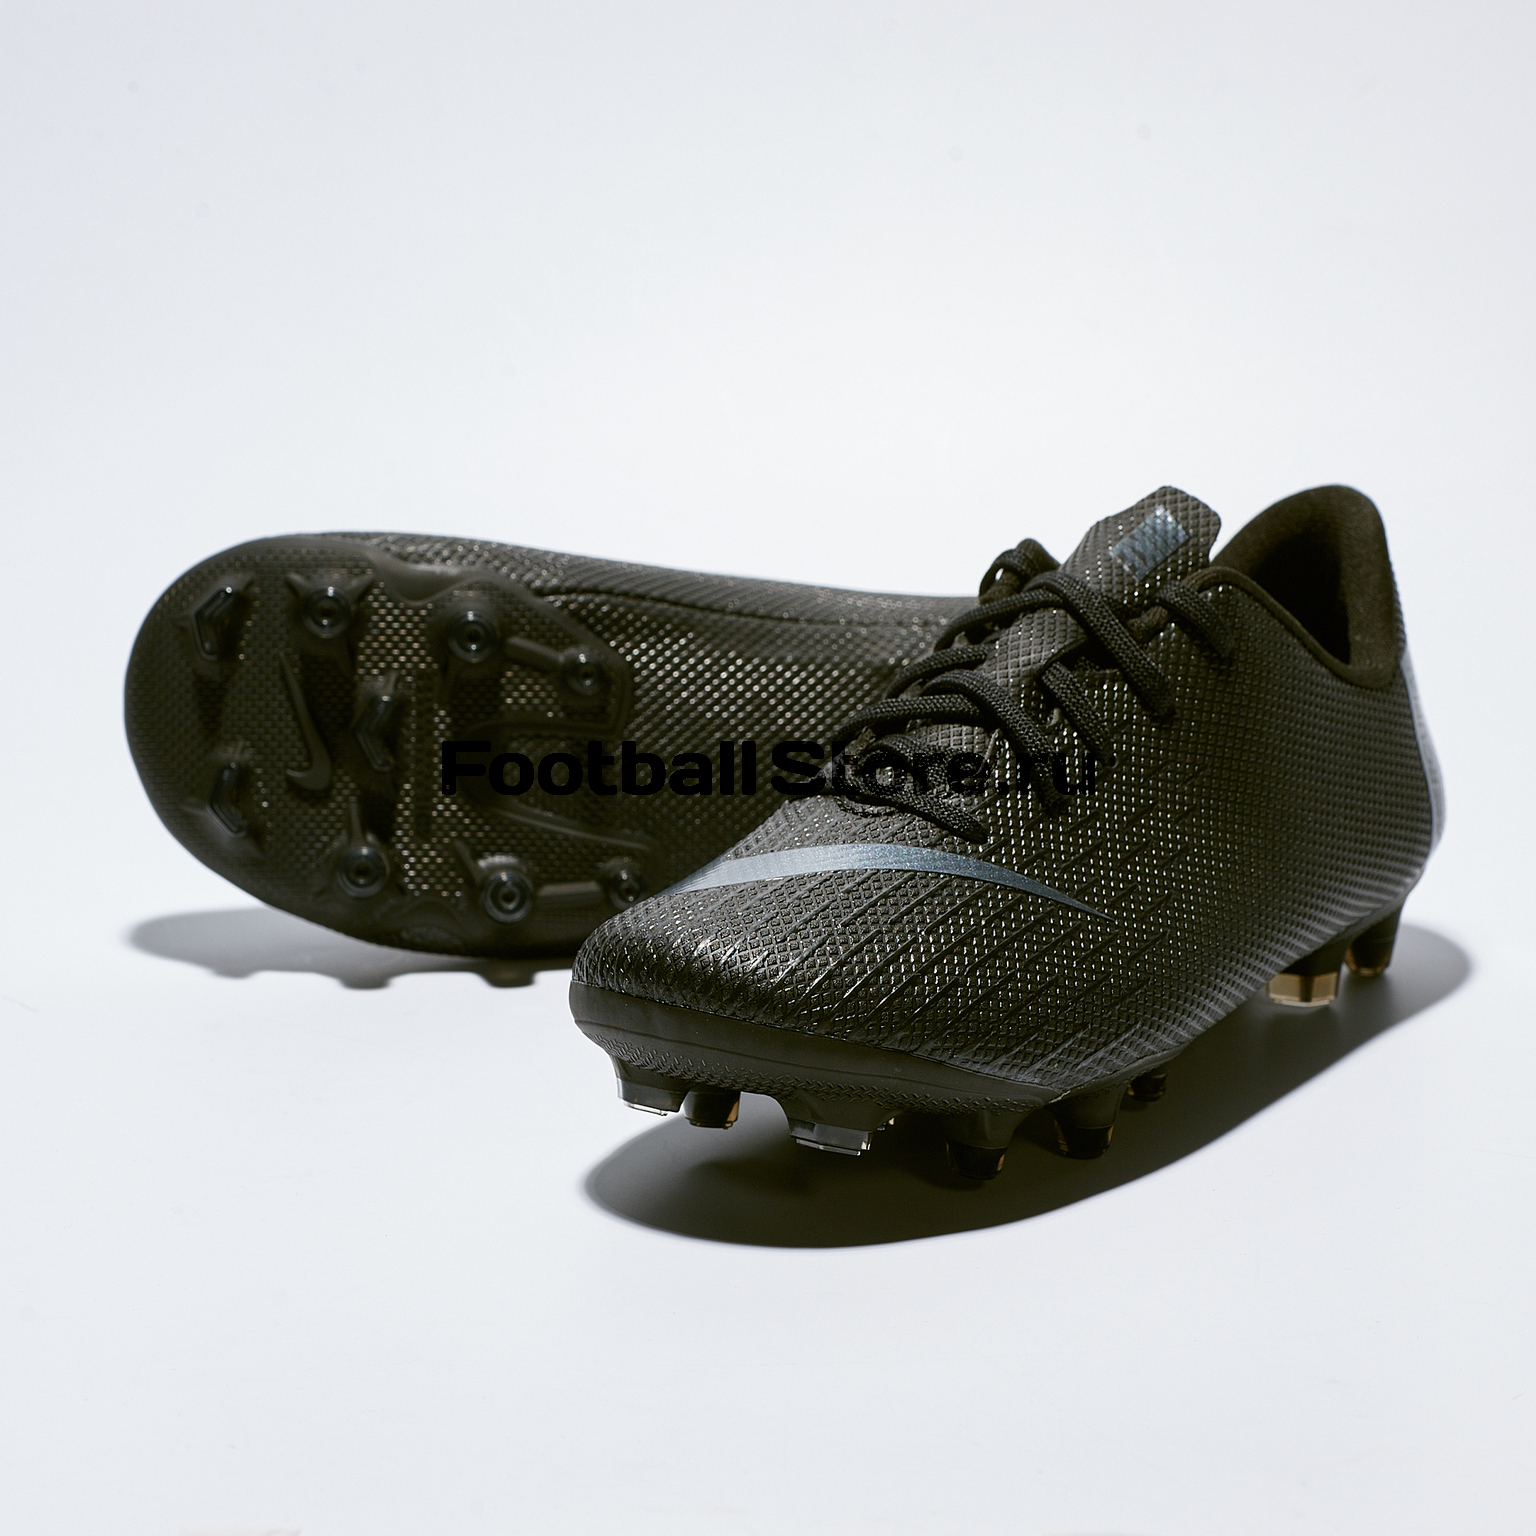 Бутсы детские Nike Vapor 12 Academy PS FG/MG AH7349-001 бутсы детские nike vapor 12 academy gs fg mg ah7347 070